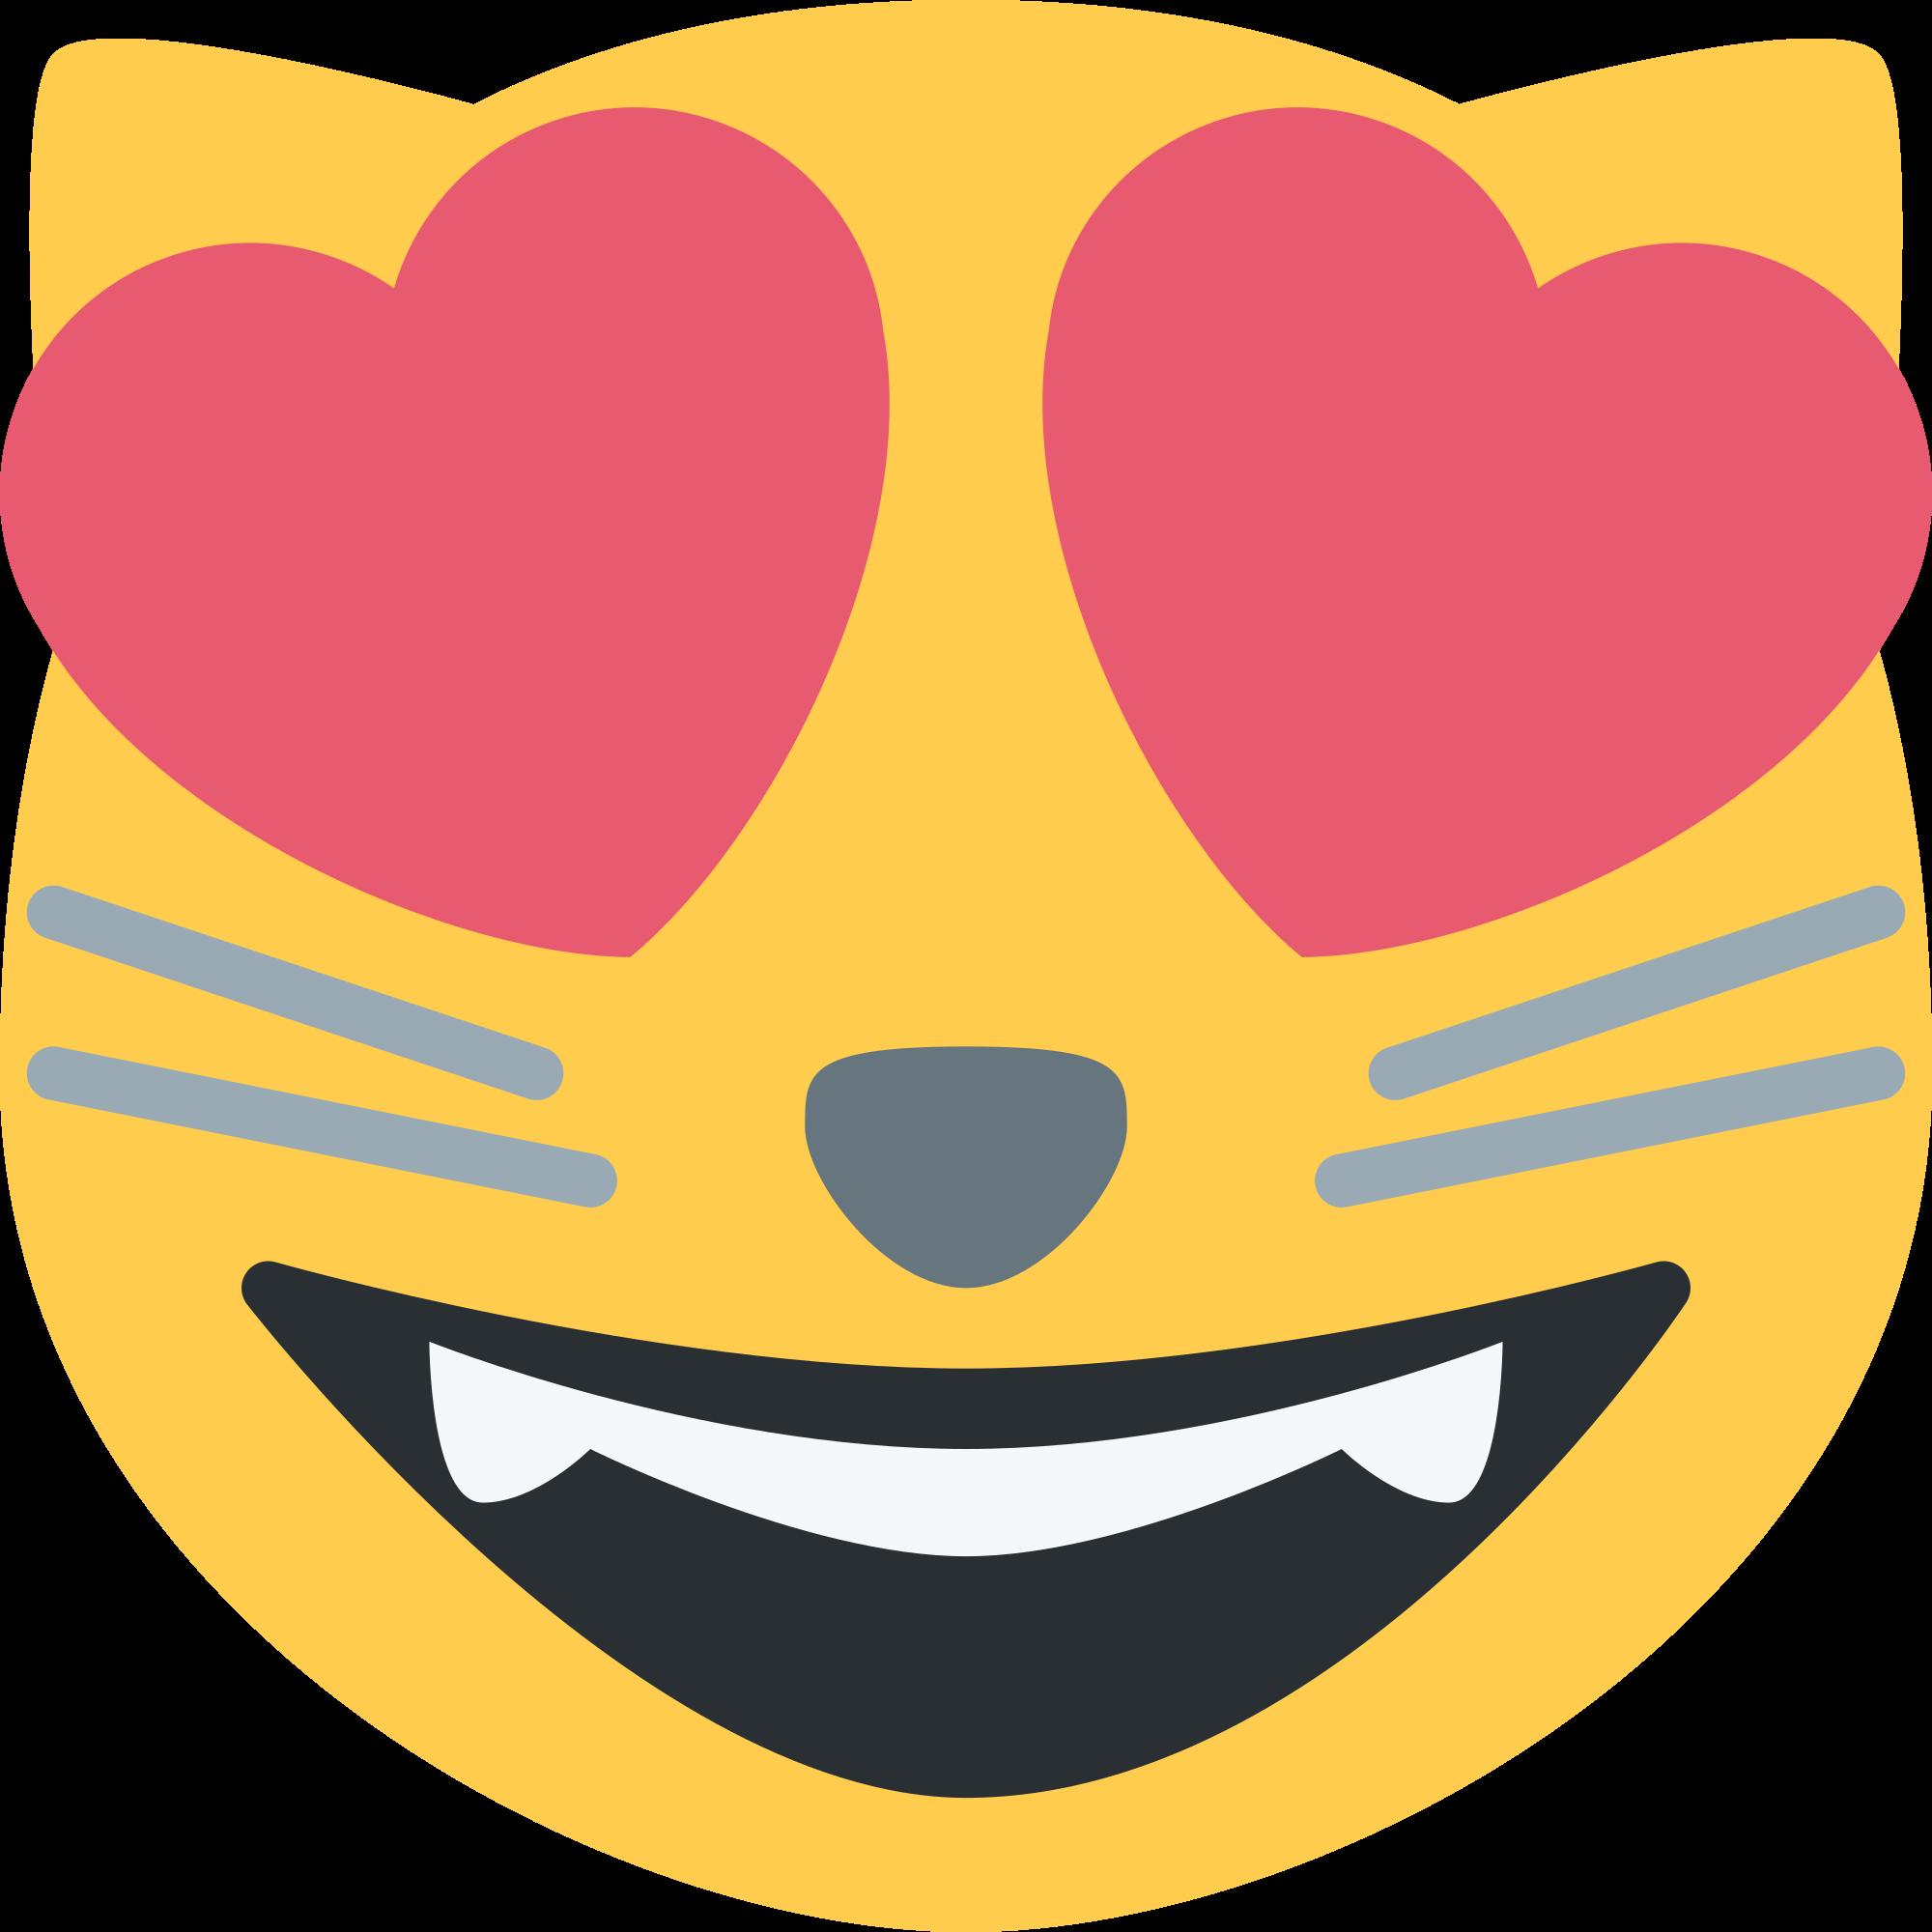 Clipart cat heart. Emoji eyes png